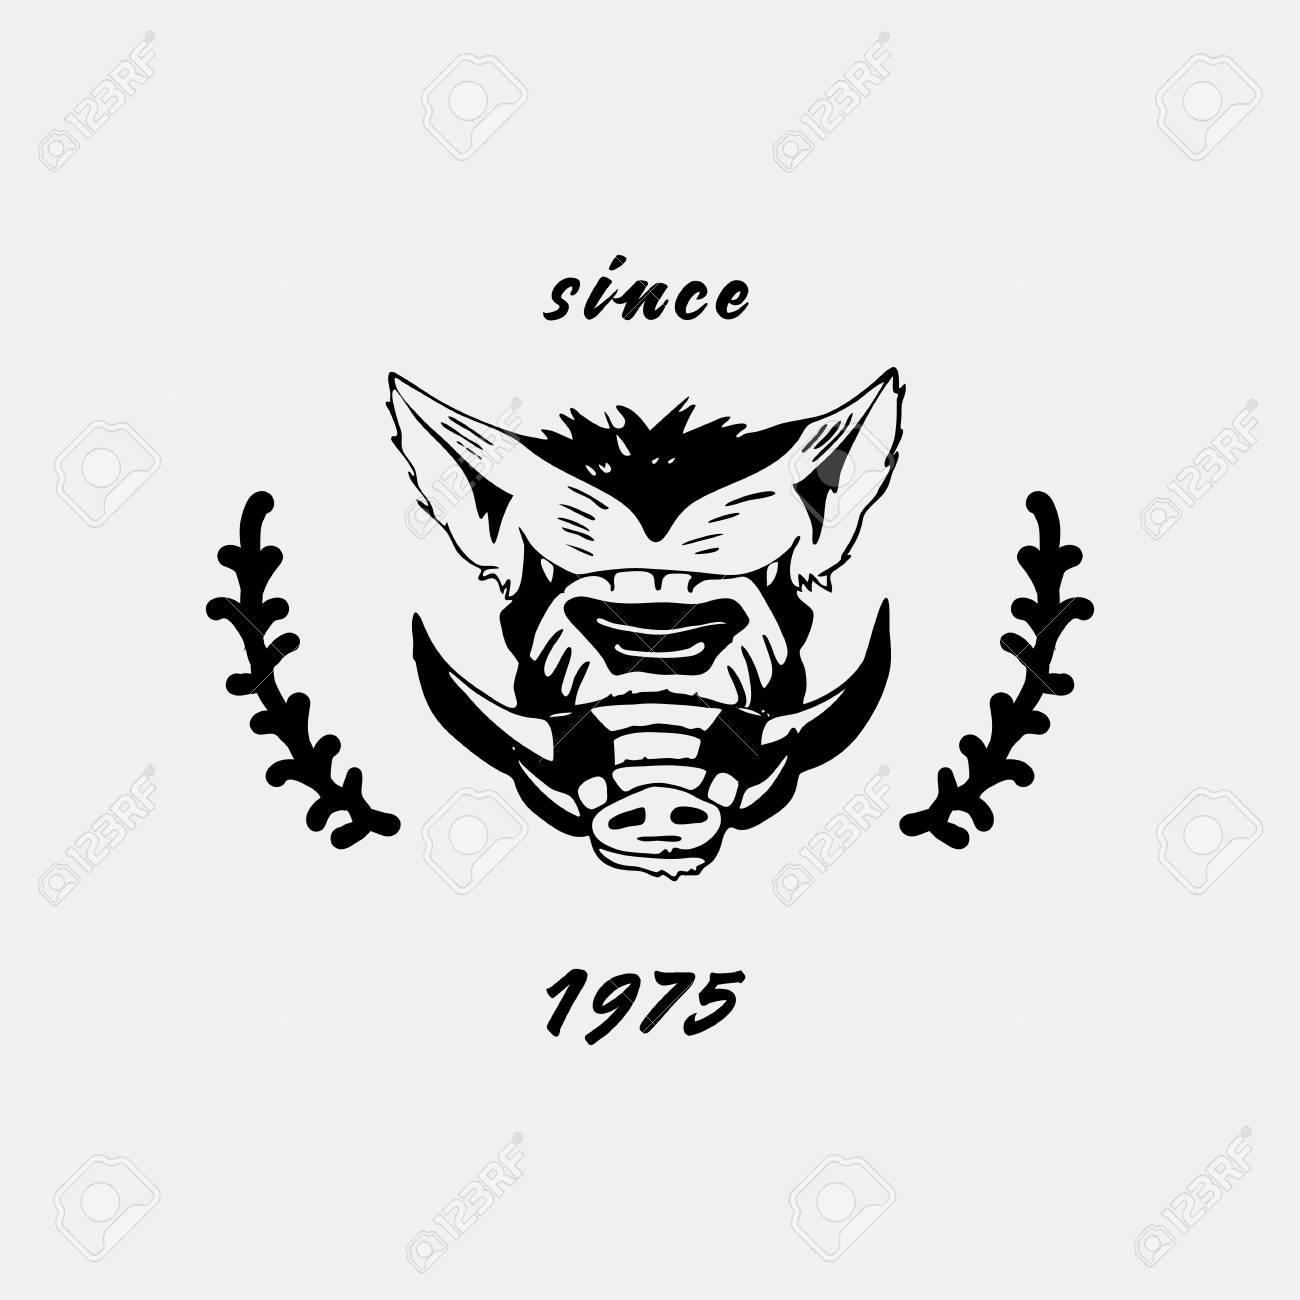 Logo Symbol Sign Stencil Boar Headunique Technique Vintage